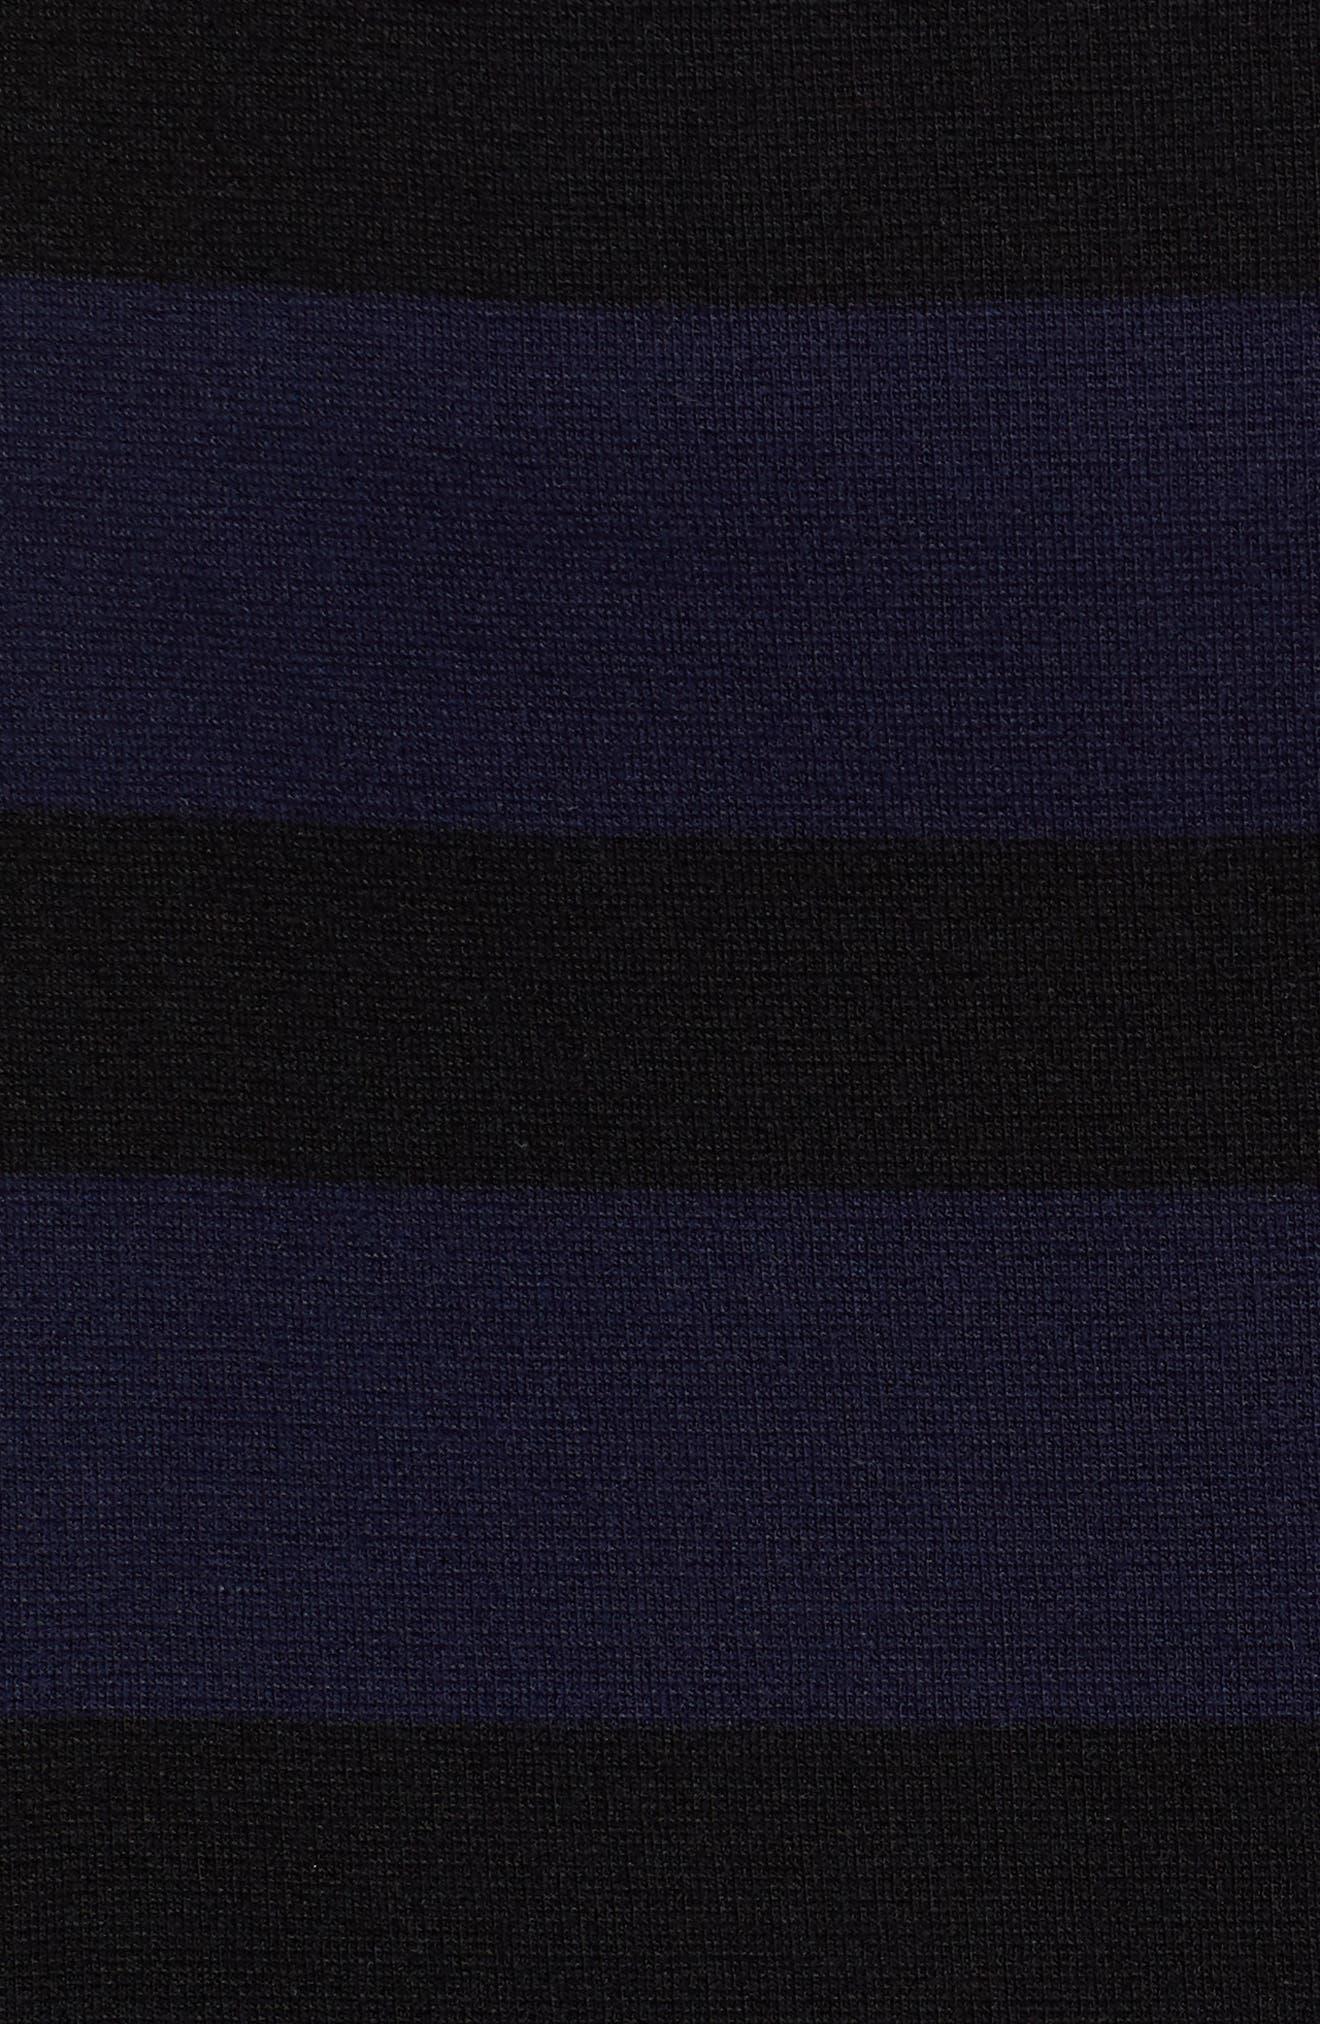 Ebienne Stripe Pencil Skirt,                             Alternate thumbnail 5, color,                             462